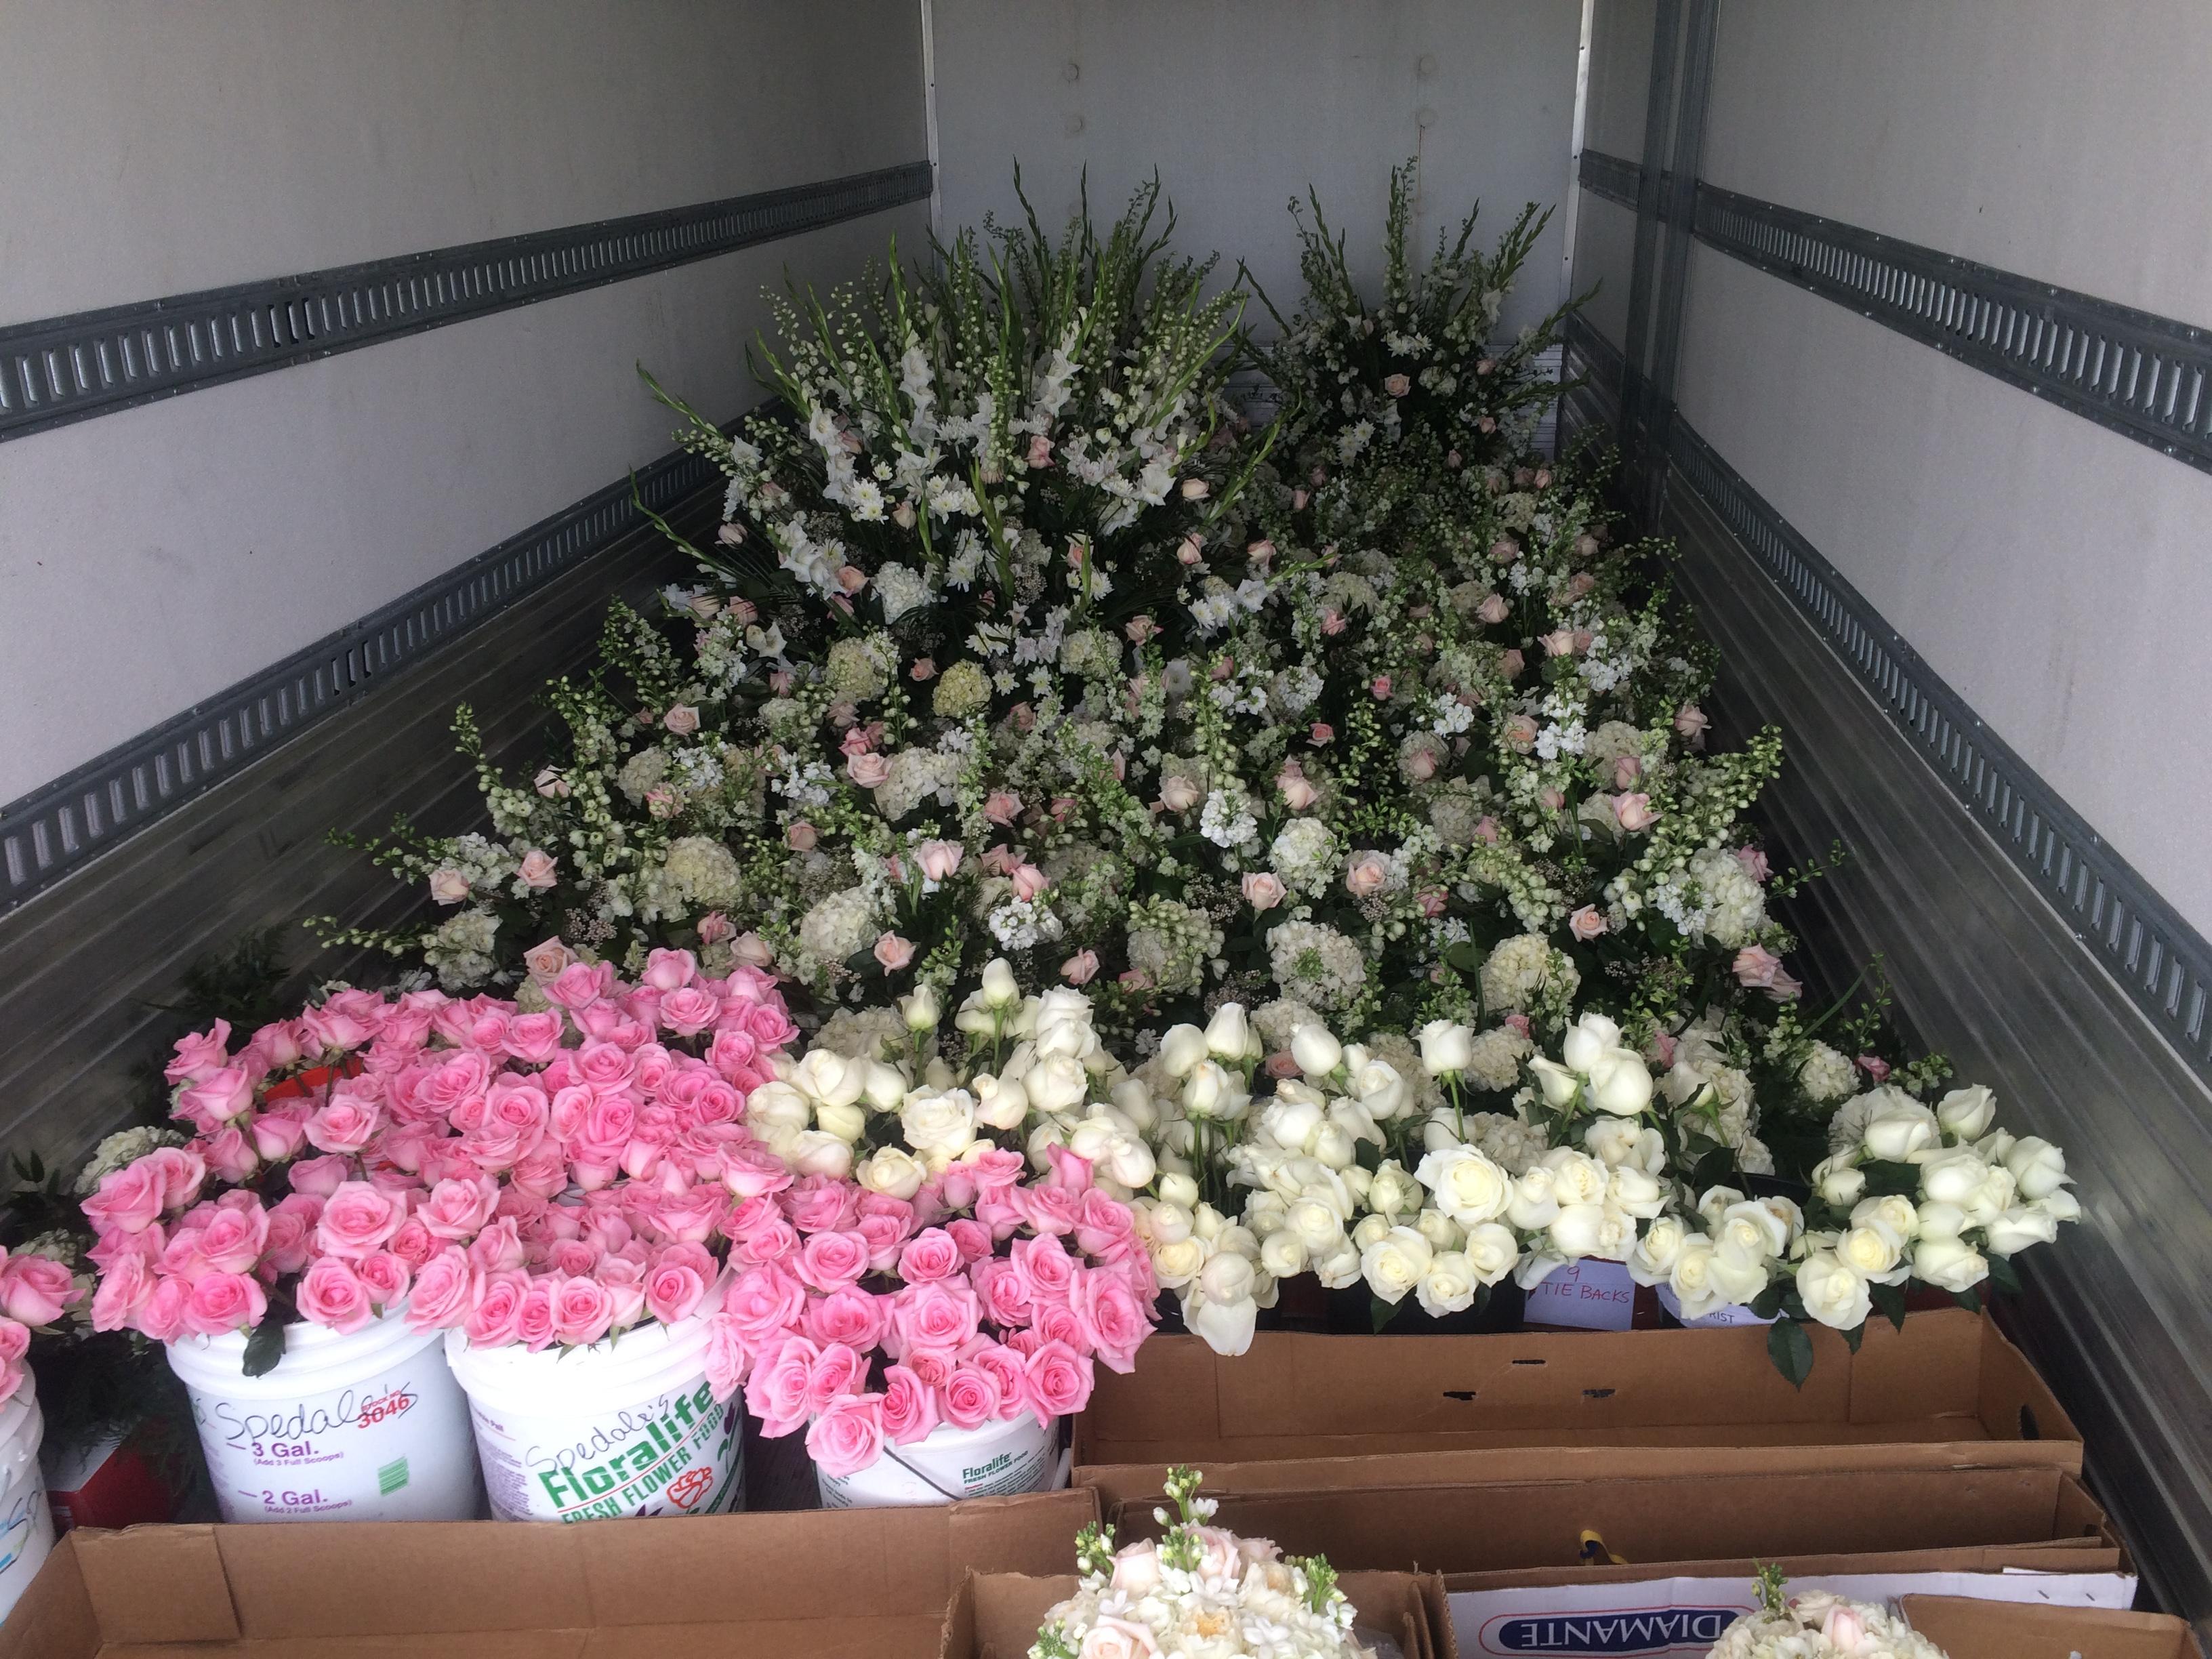 Spedales florist and wholesale 110 production dr 101 lafayette la spedales florist and wholesale 110 production dr 101 lafayette la florists mapquest izmirmasajfo Images